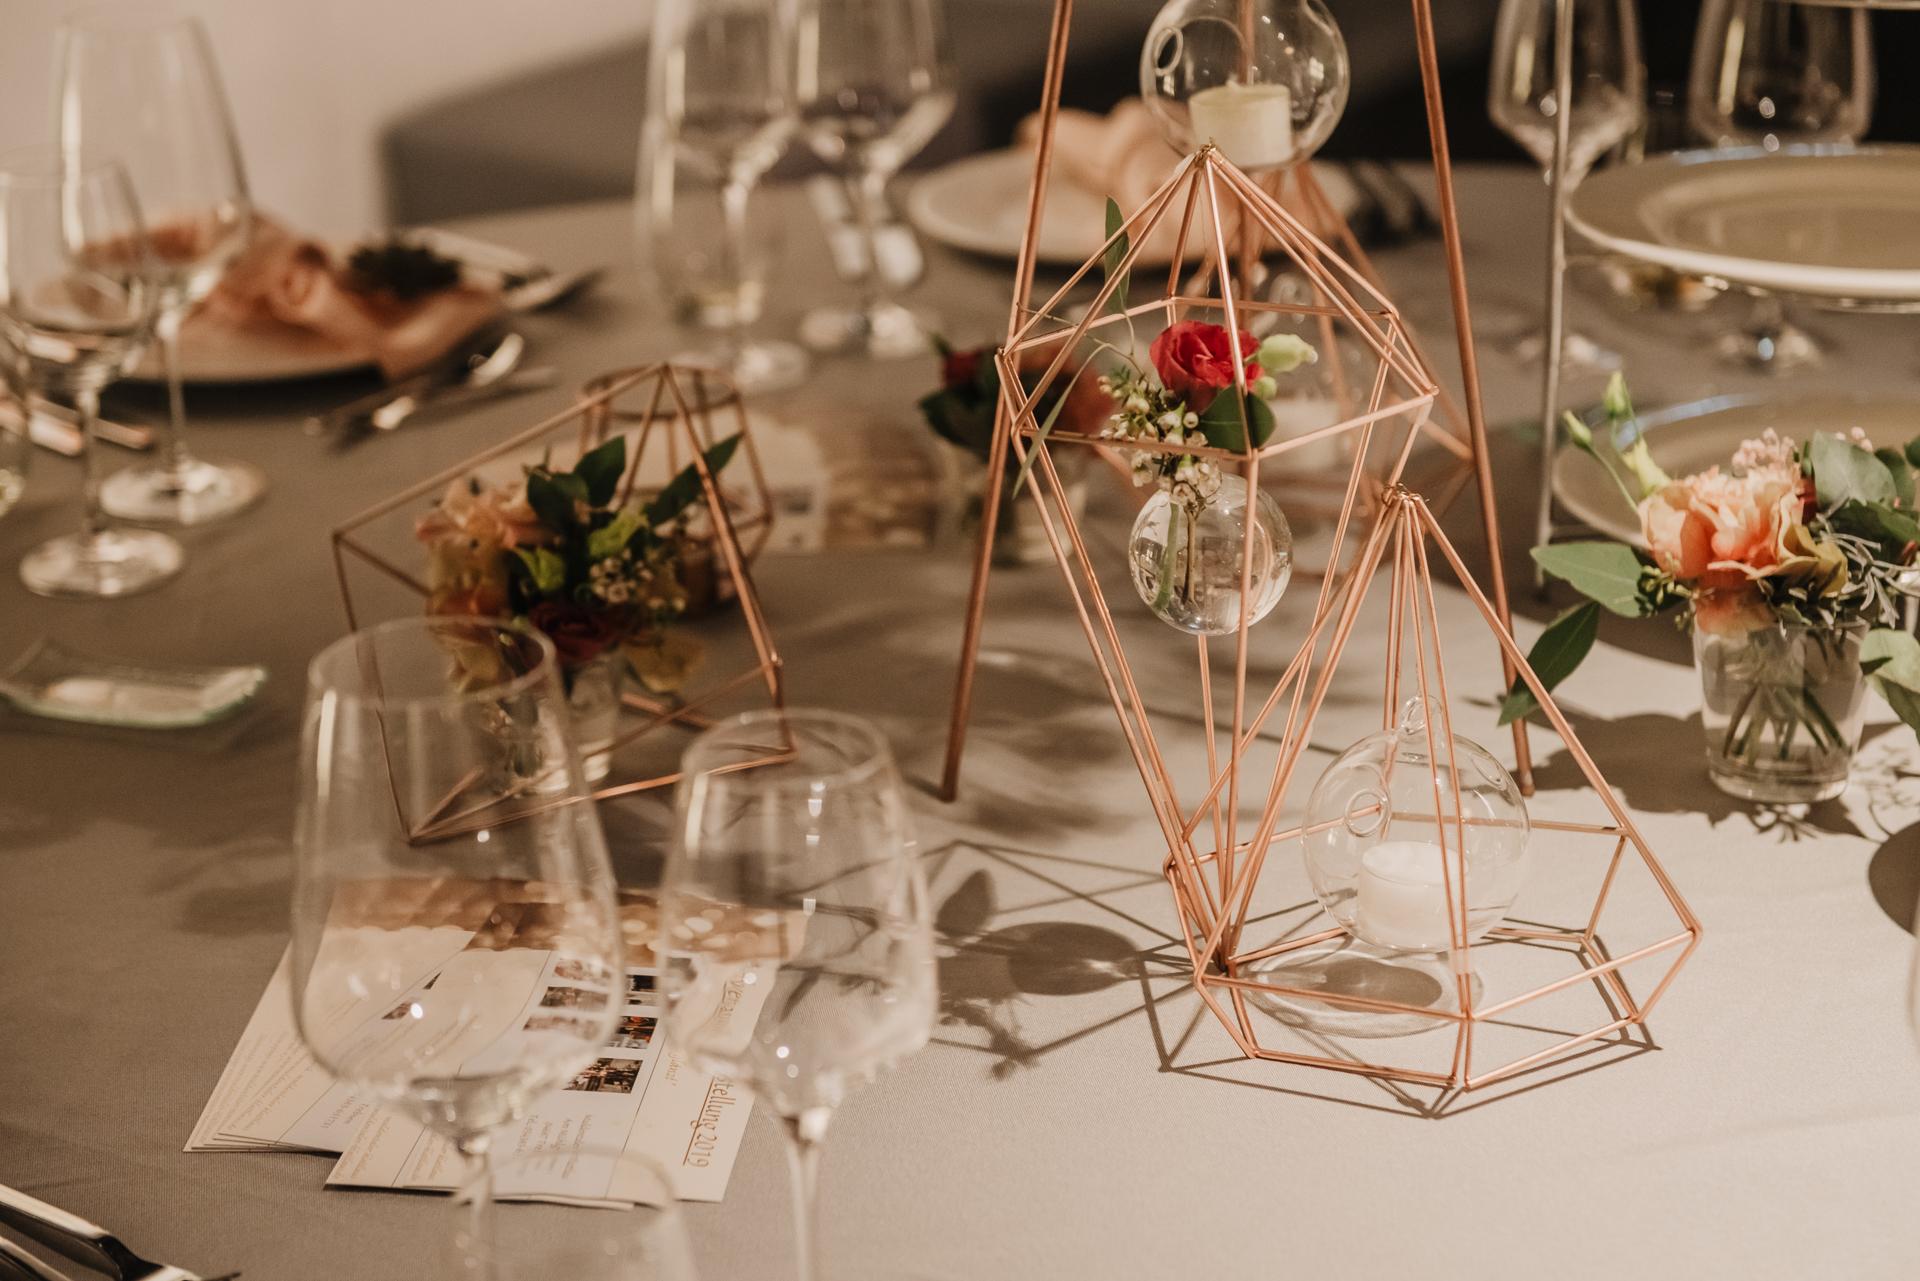 Zweinander-LeonoreHerzog-WeddingMarket-OnTour20191110-9689